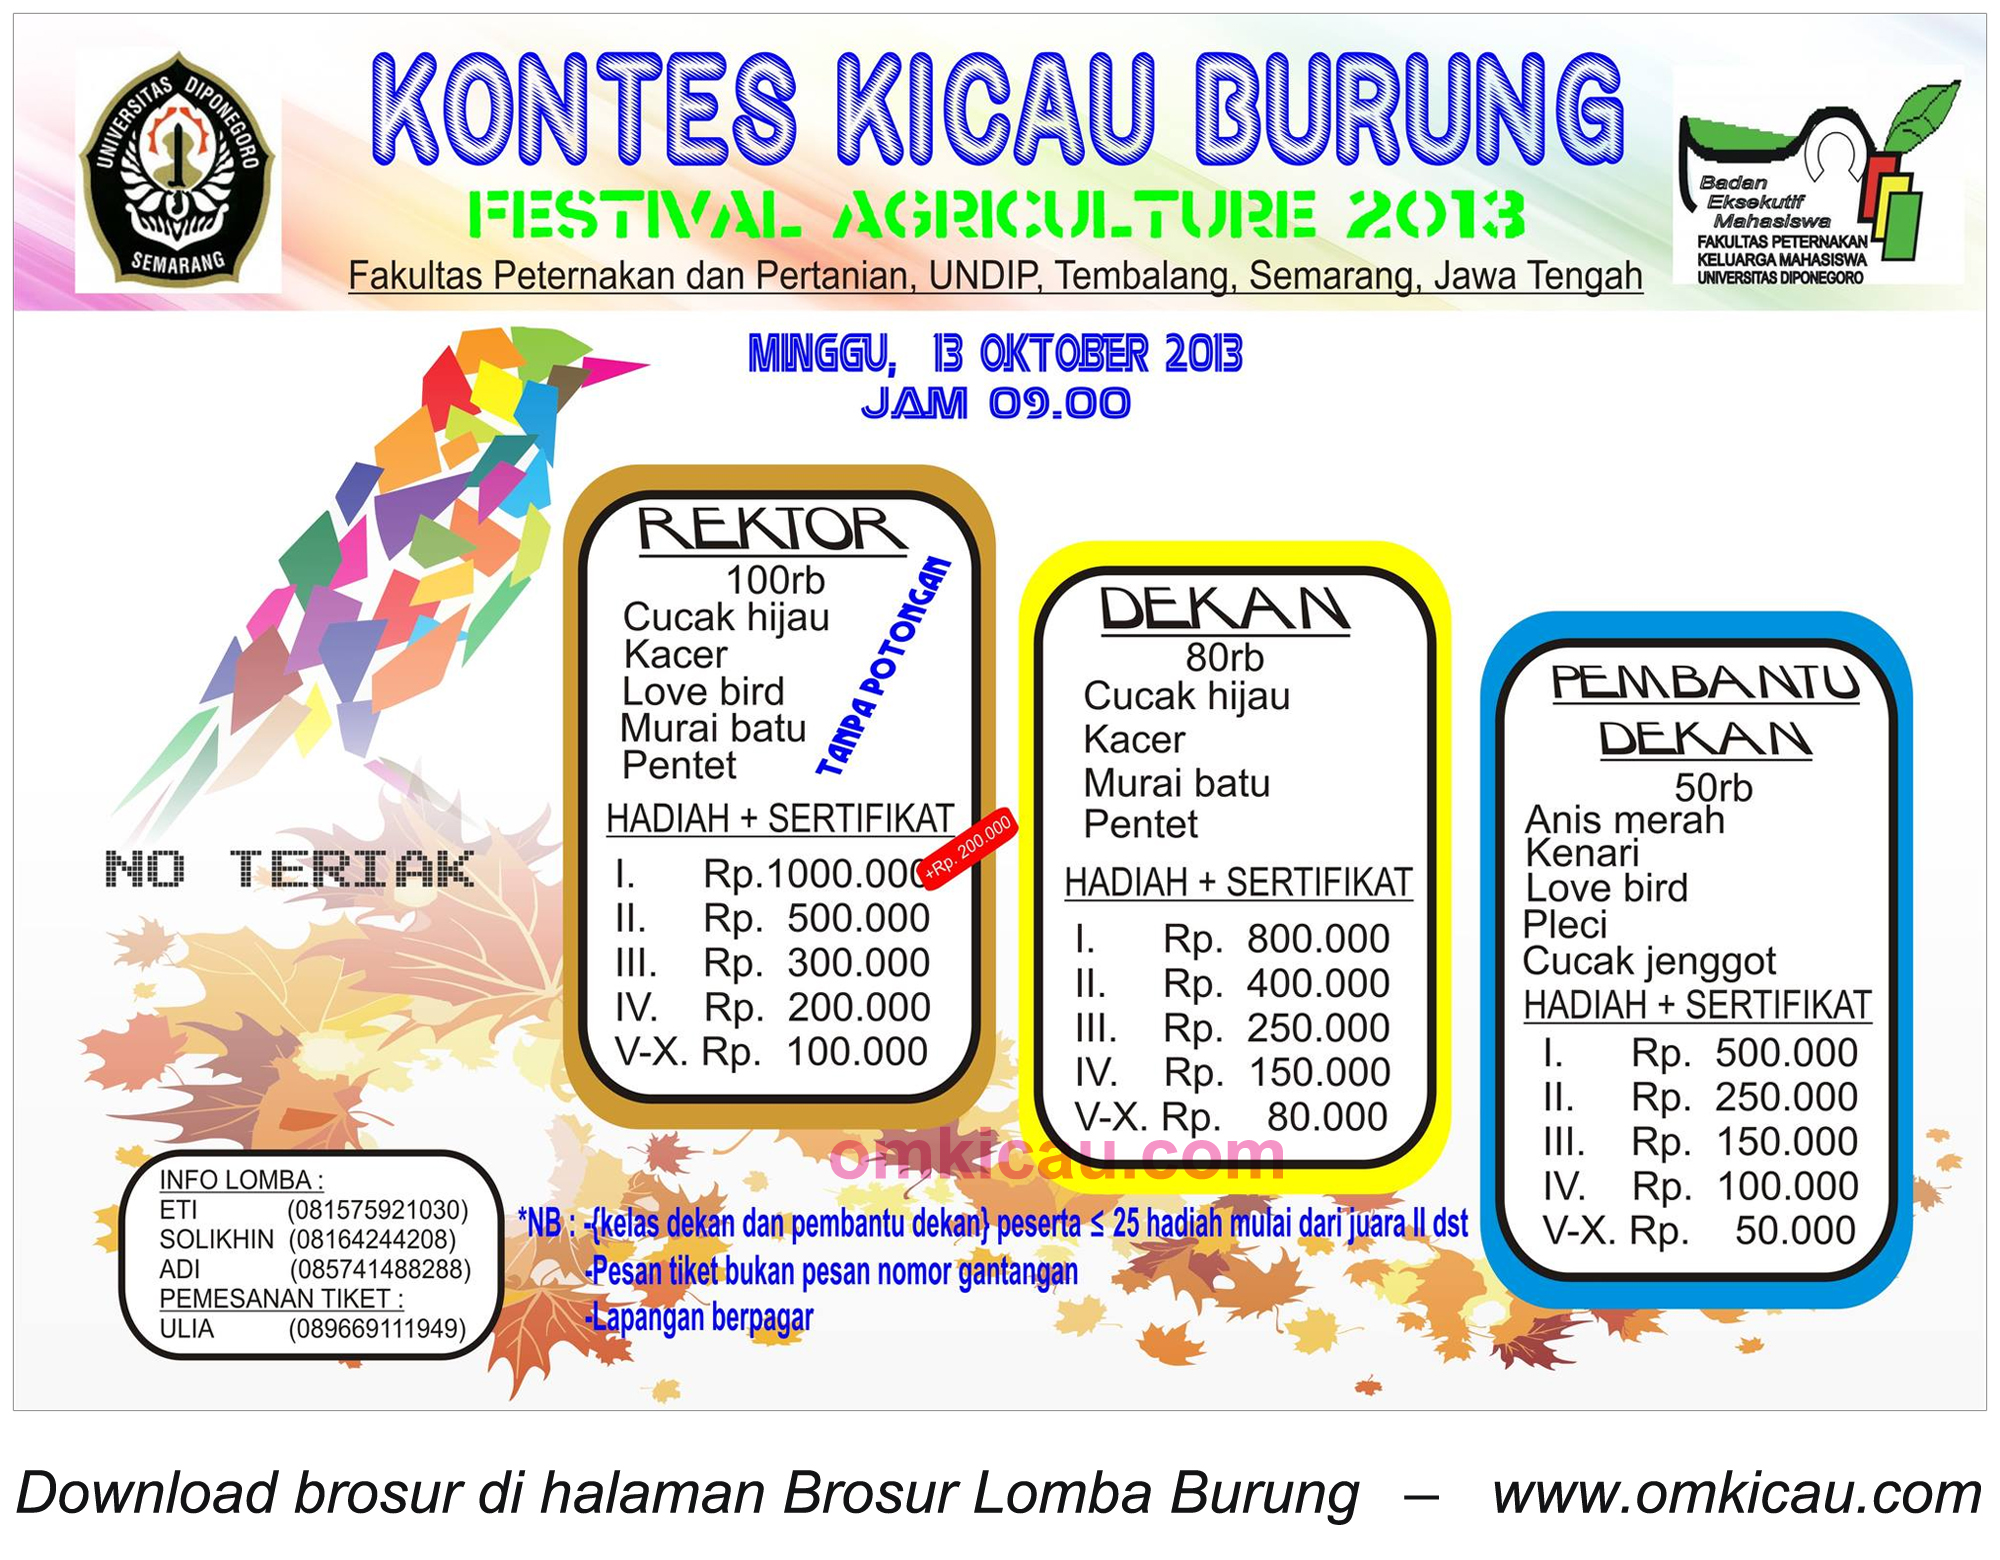 Brosur Kontes Kicau Burung - Fapet Undip, Semarang, 13 Oktober 2013